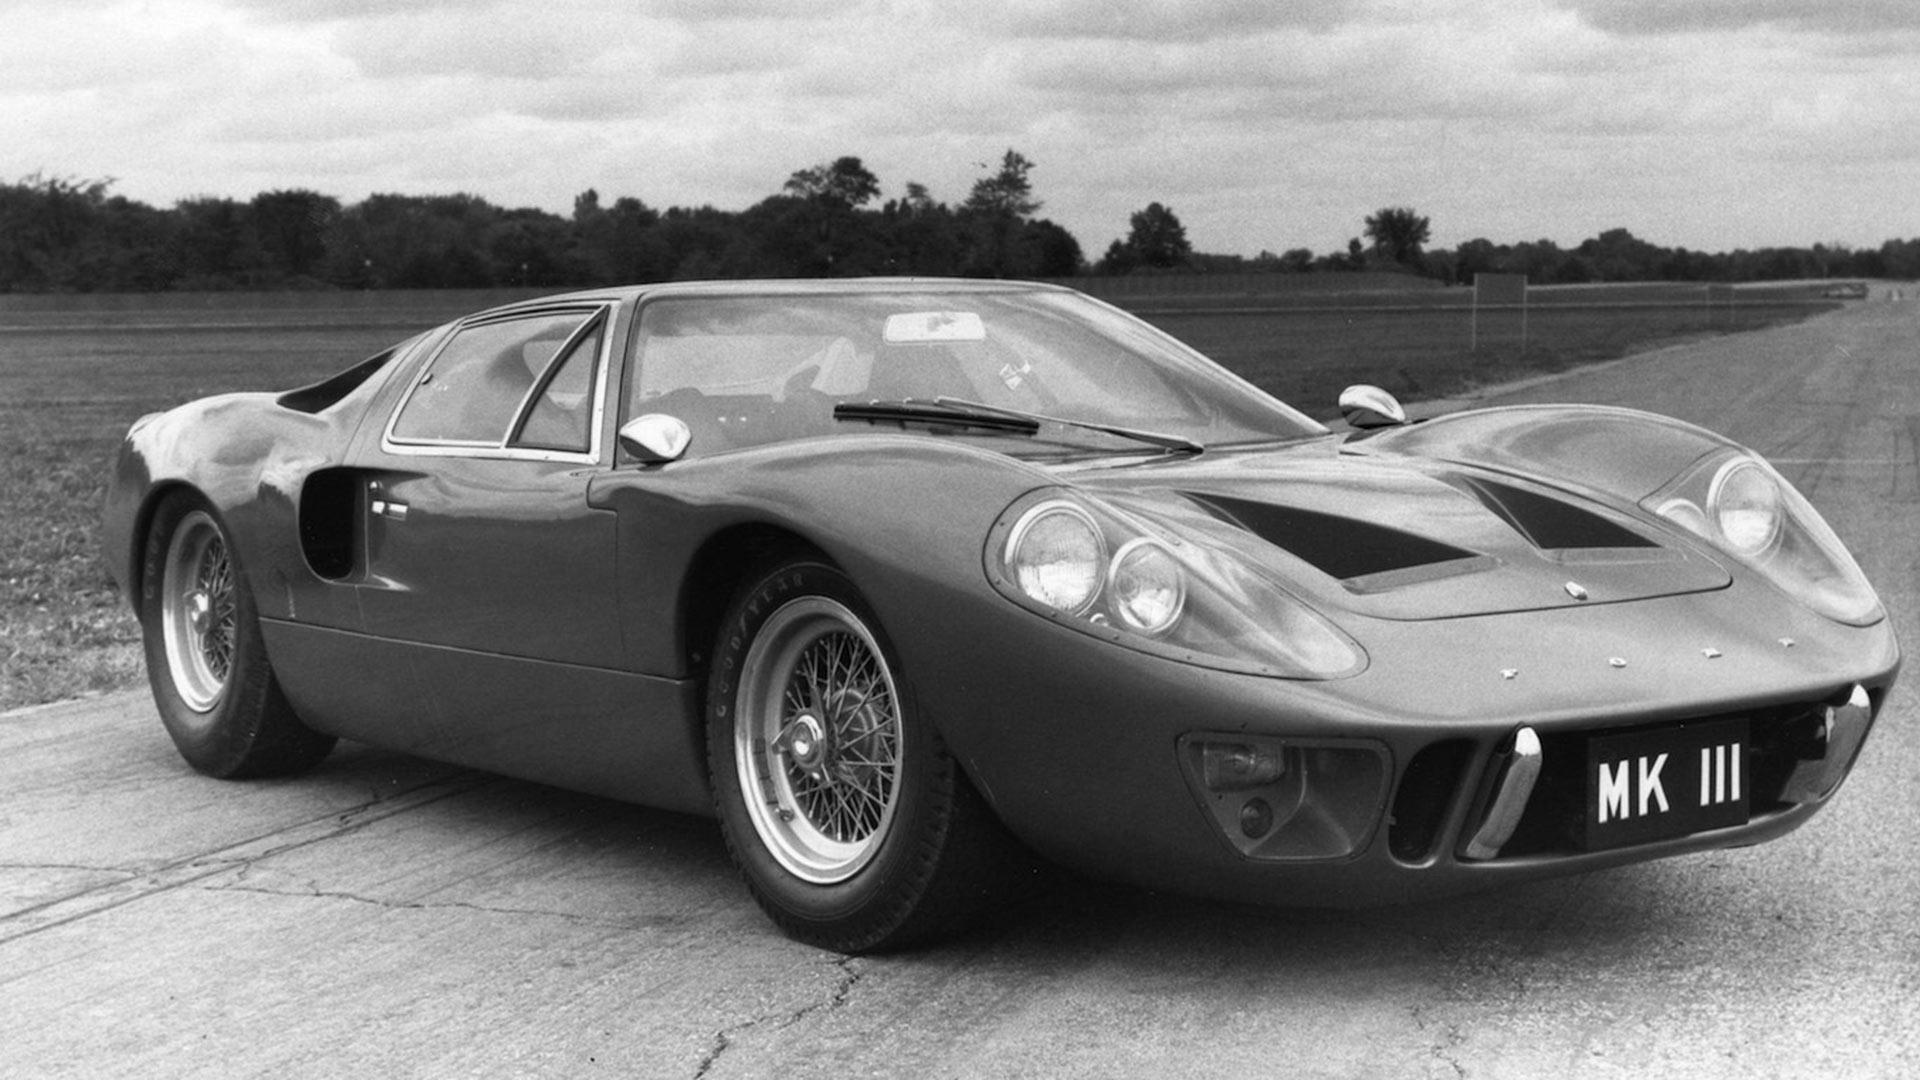 1967 Ford GT40 Mk III road car